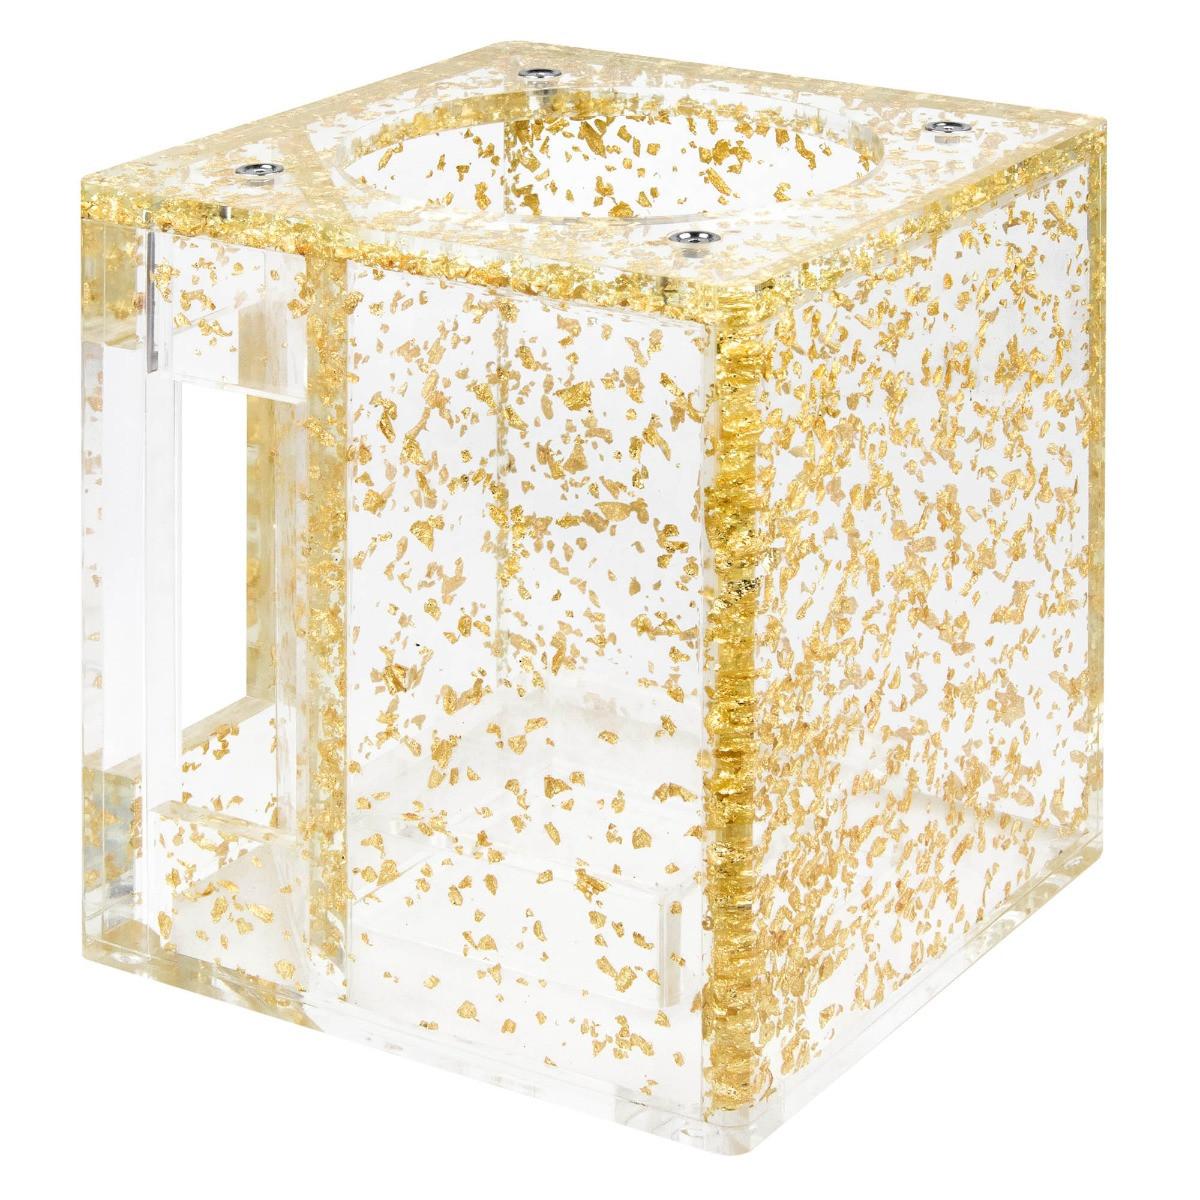 Hoob Cube Gold Распродажа | Колба для кальяна